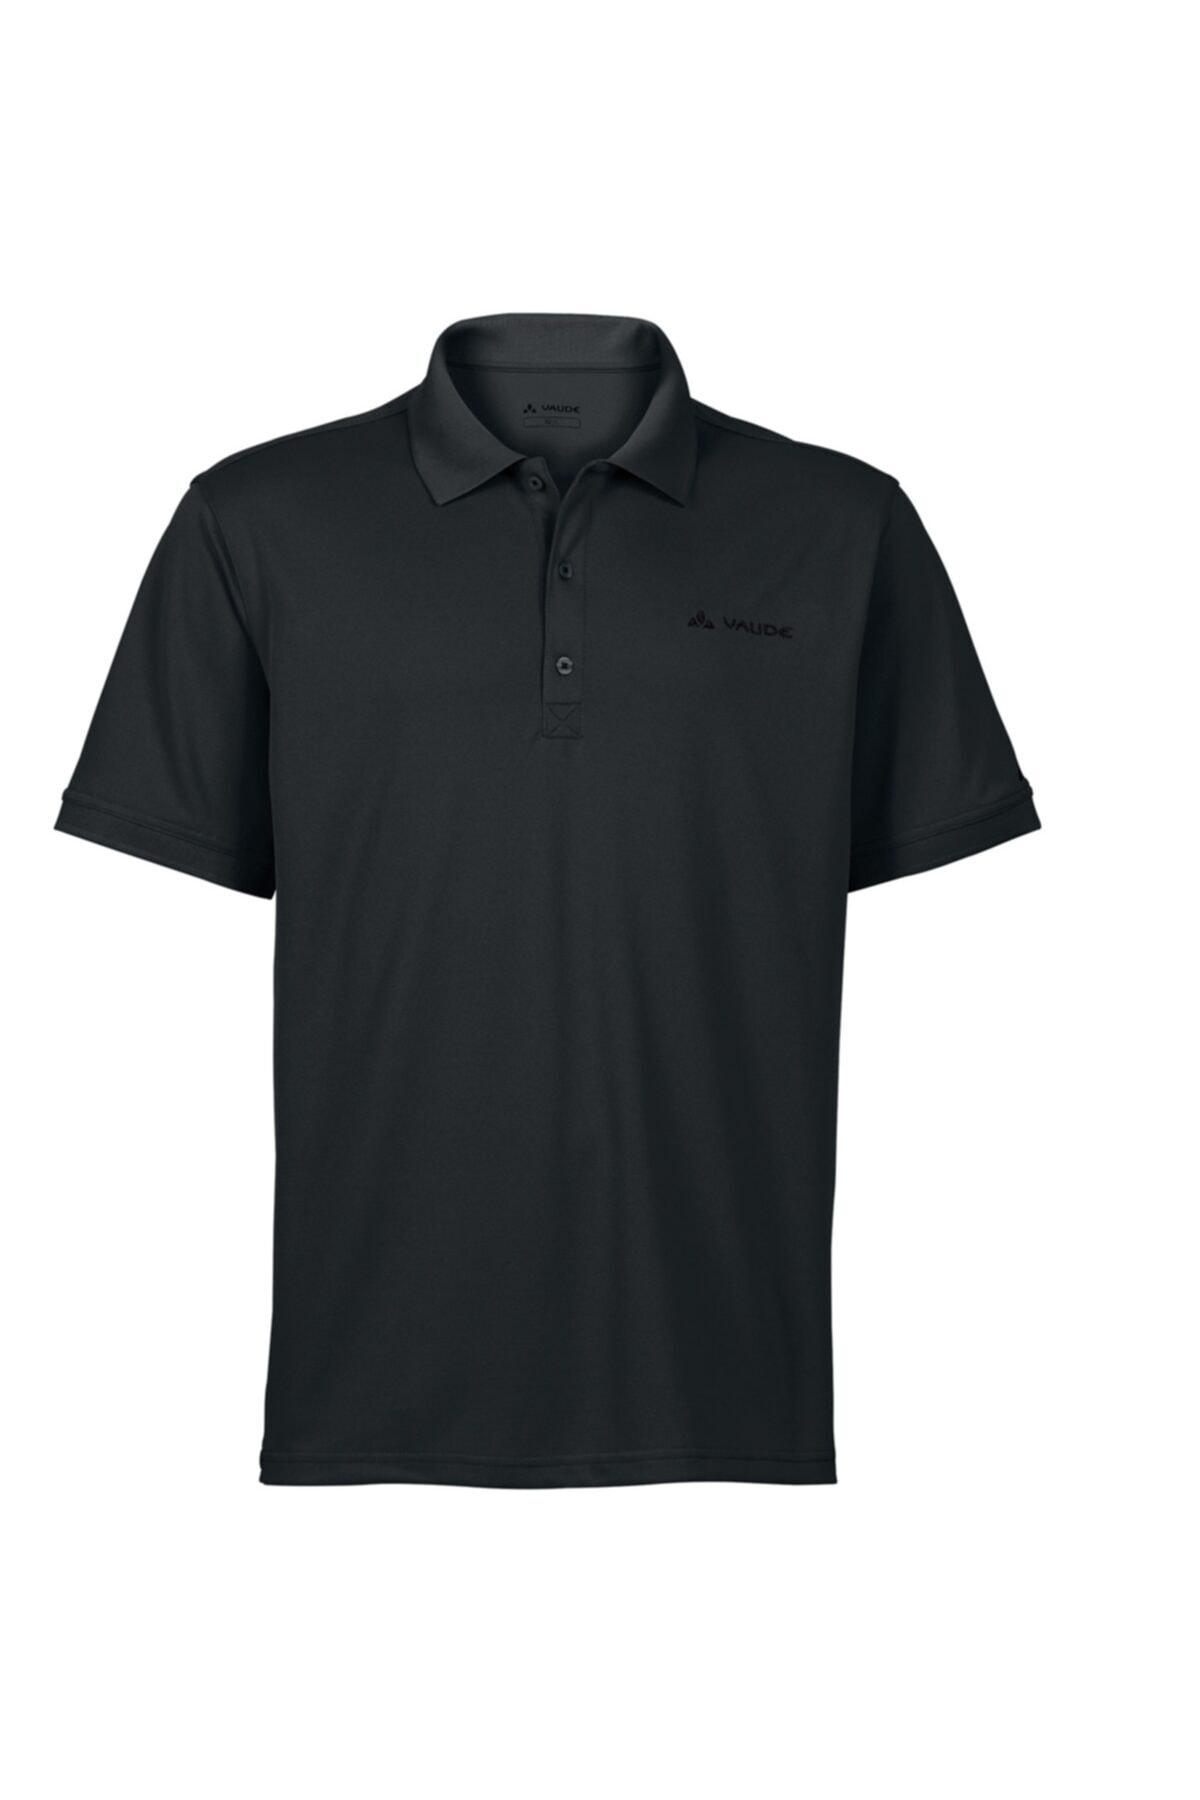 VAUDE Me Marwick Polo II T-Shirt 40034 1